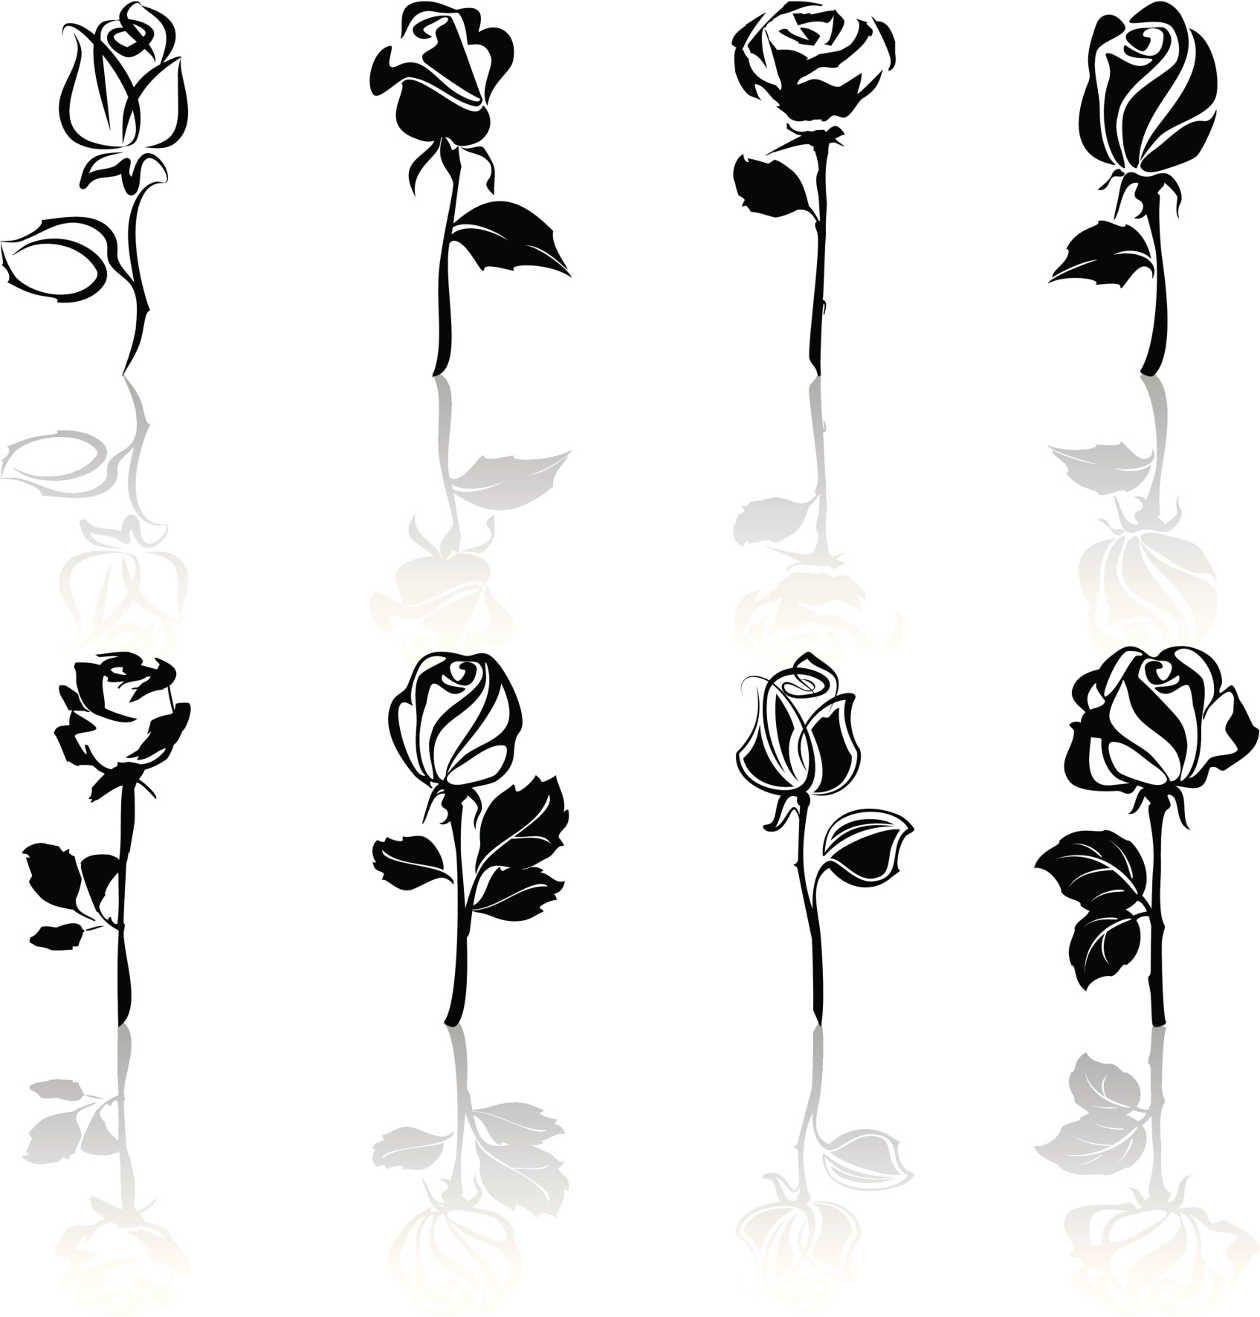 icono blanco negro tulipan - Buscar con Google | dibujos piolas ...